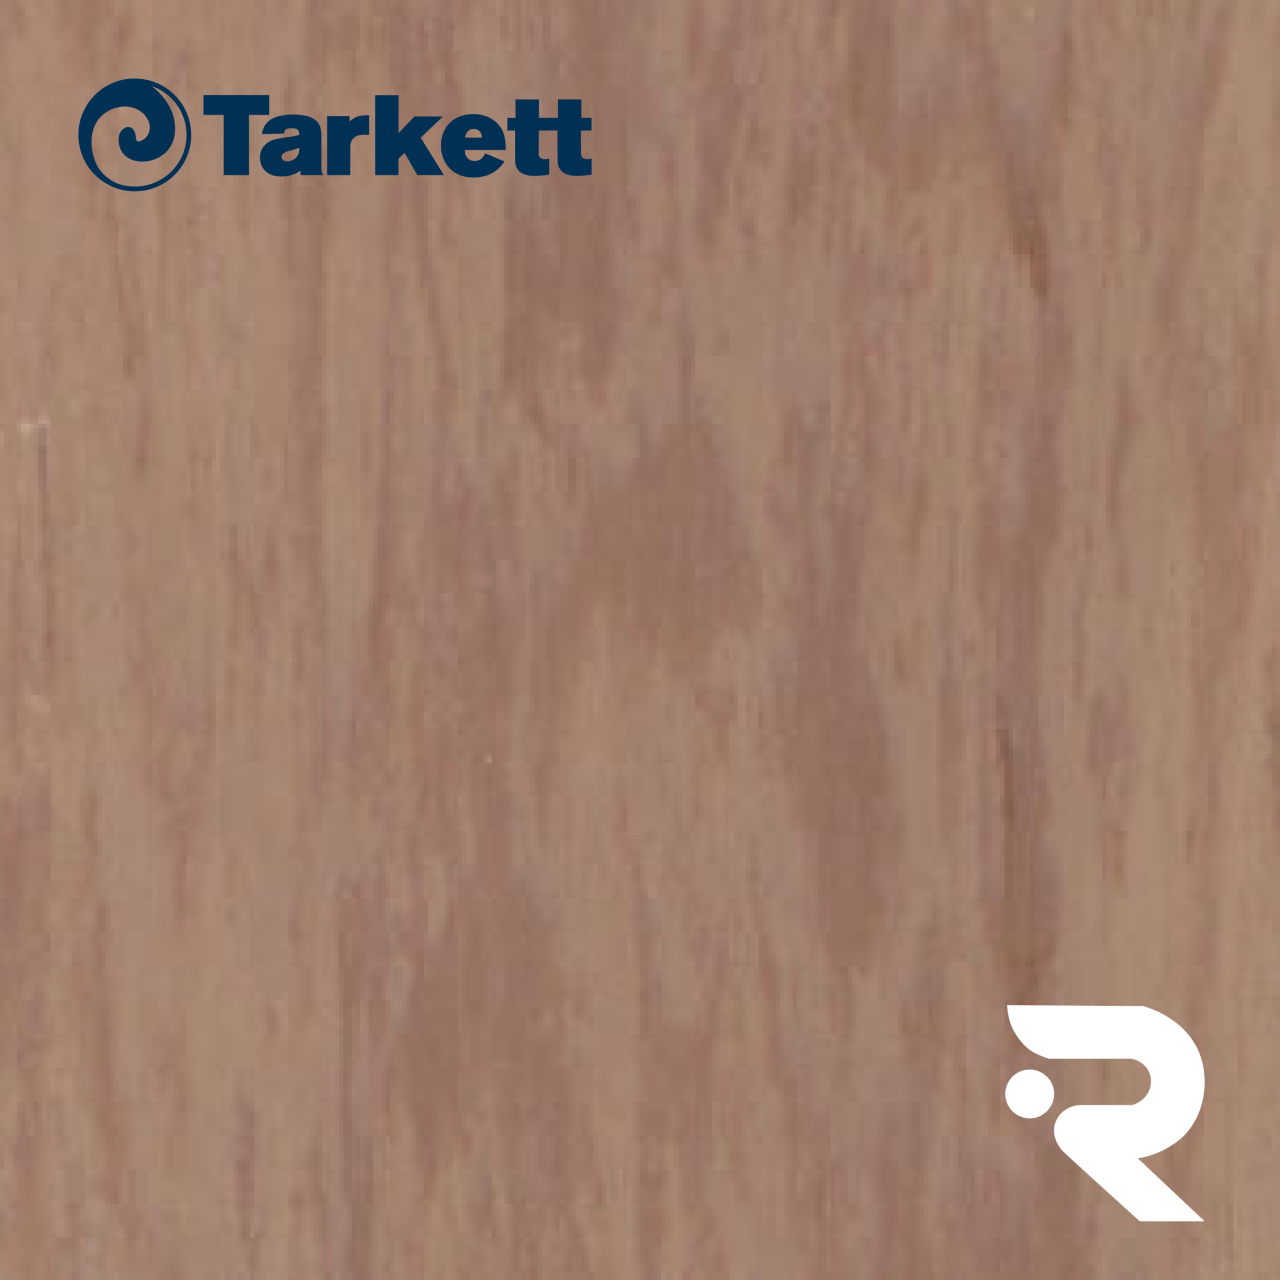 🏫 Гомогенний лінолеум Tarkett   Standard SAND DARK 0915   Standard Plus 2.0 mm   2 х 23 м